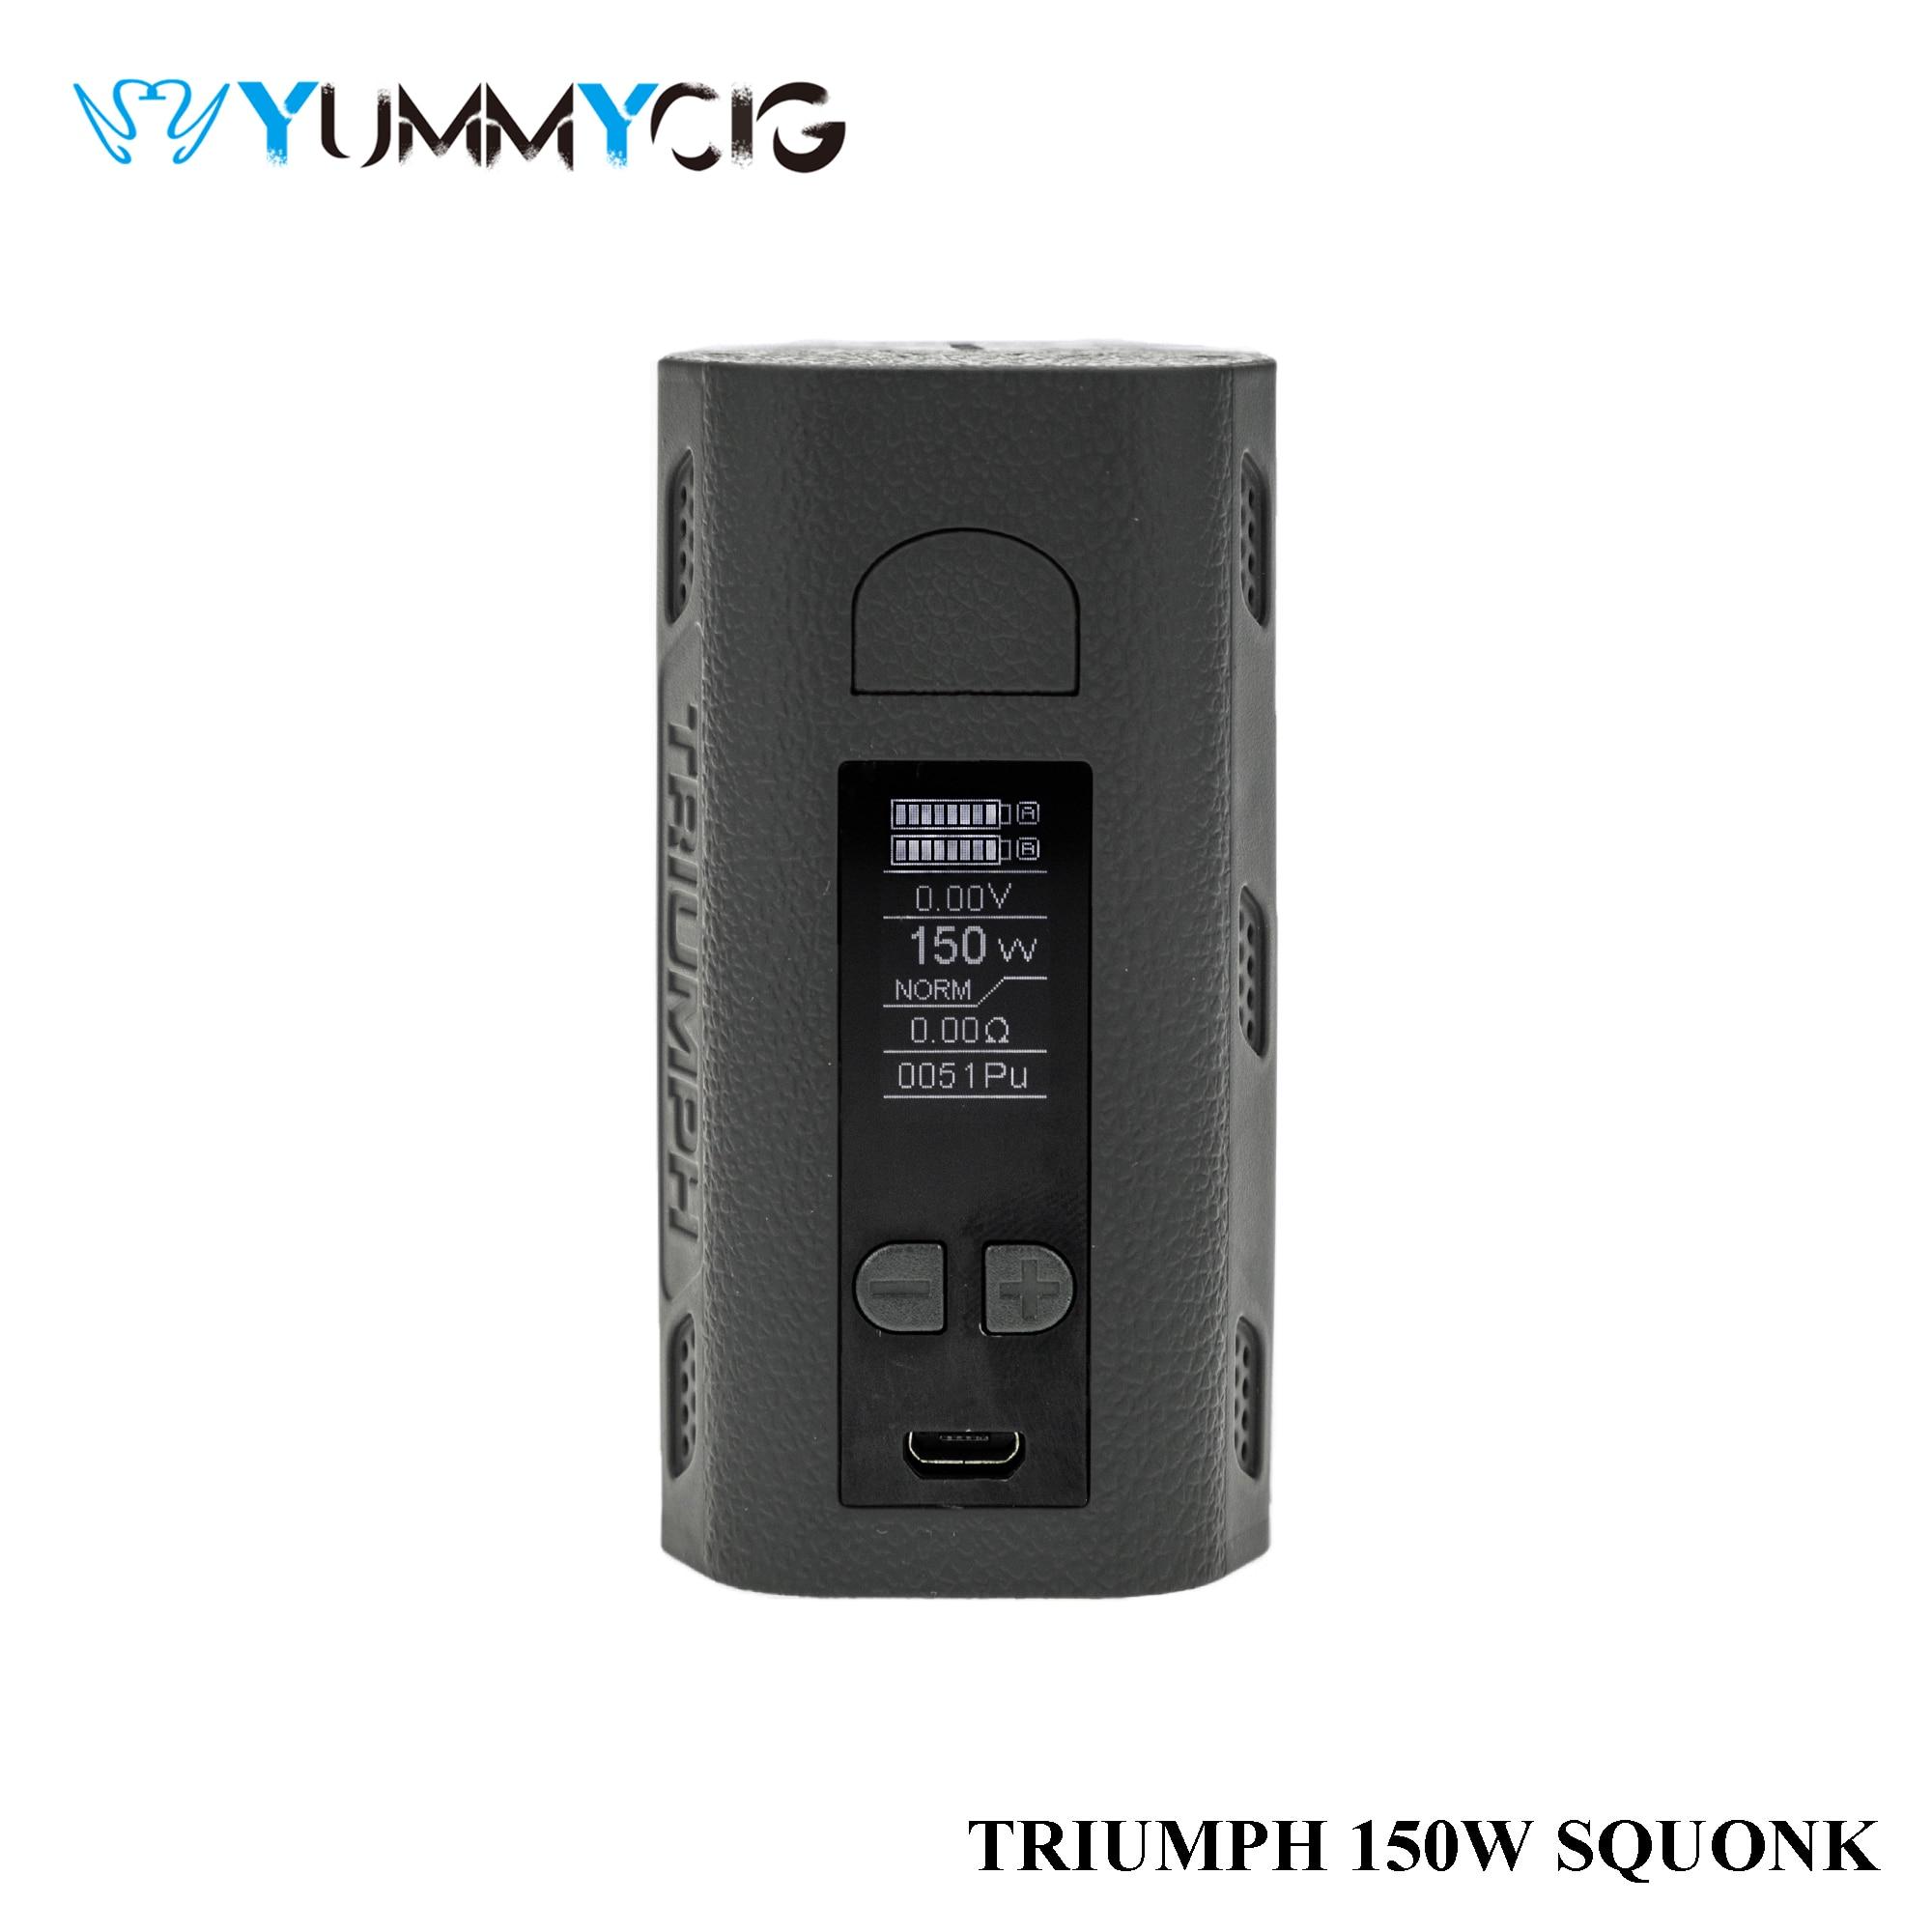 Double 18650 Batteries Triumph 150w Vapor Mod Yummycig Vape Box Squonk mod|Electronic Cigarette Kits| - AliExpress